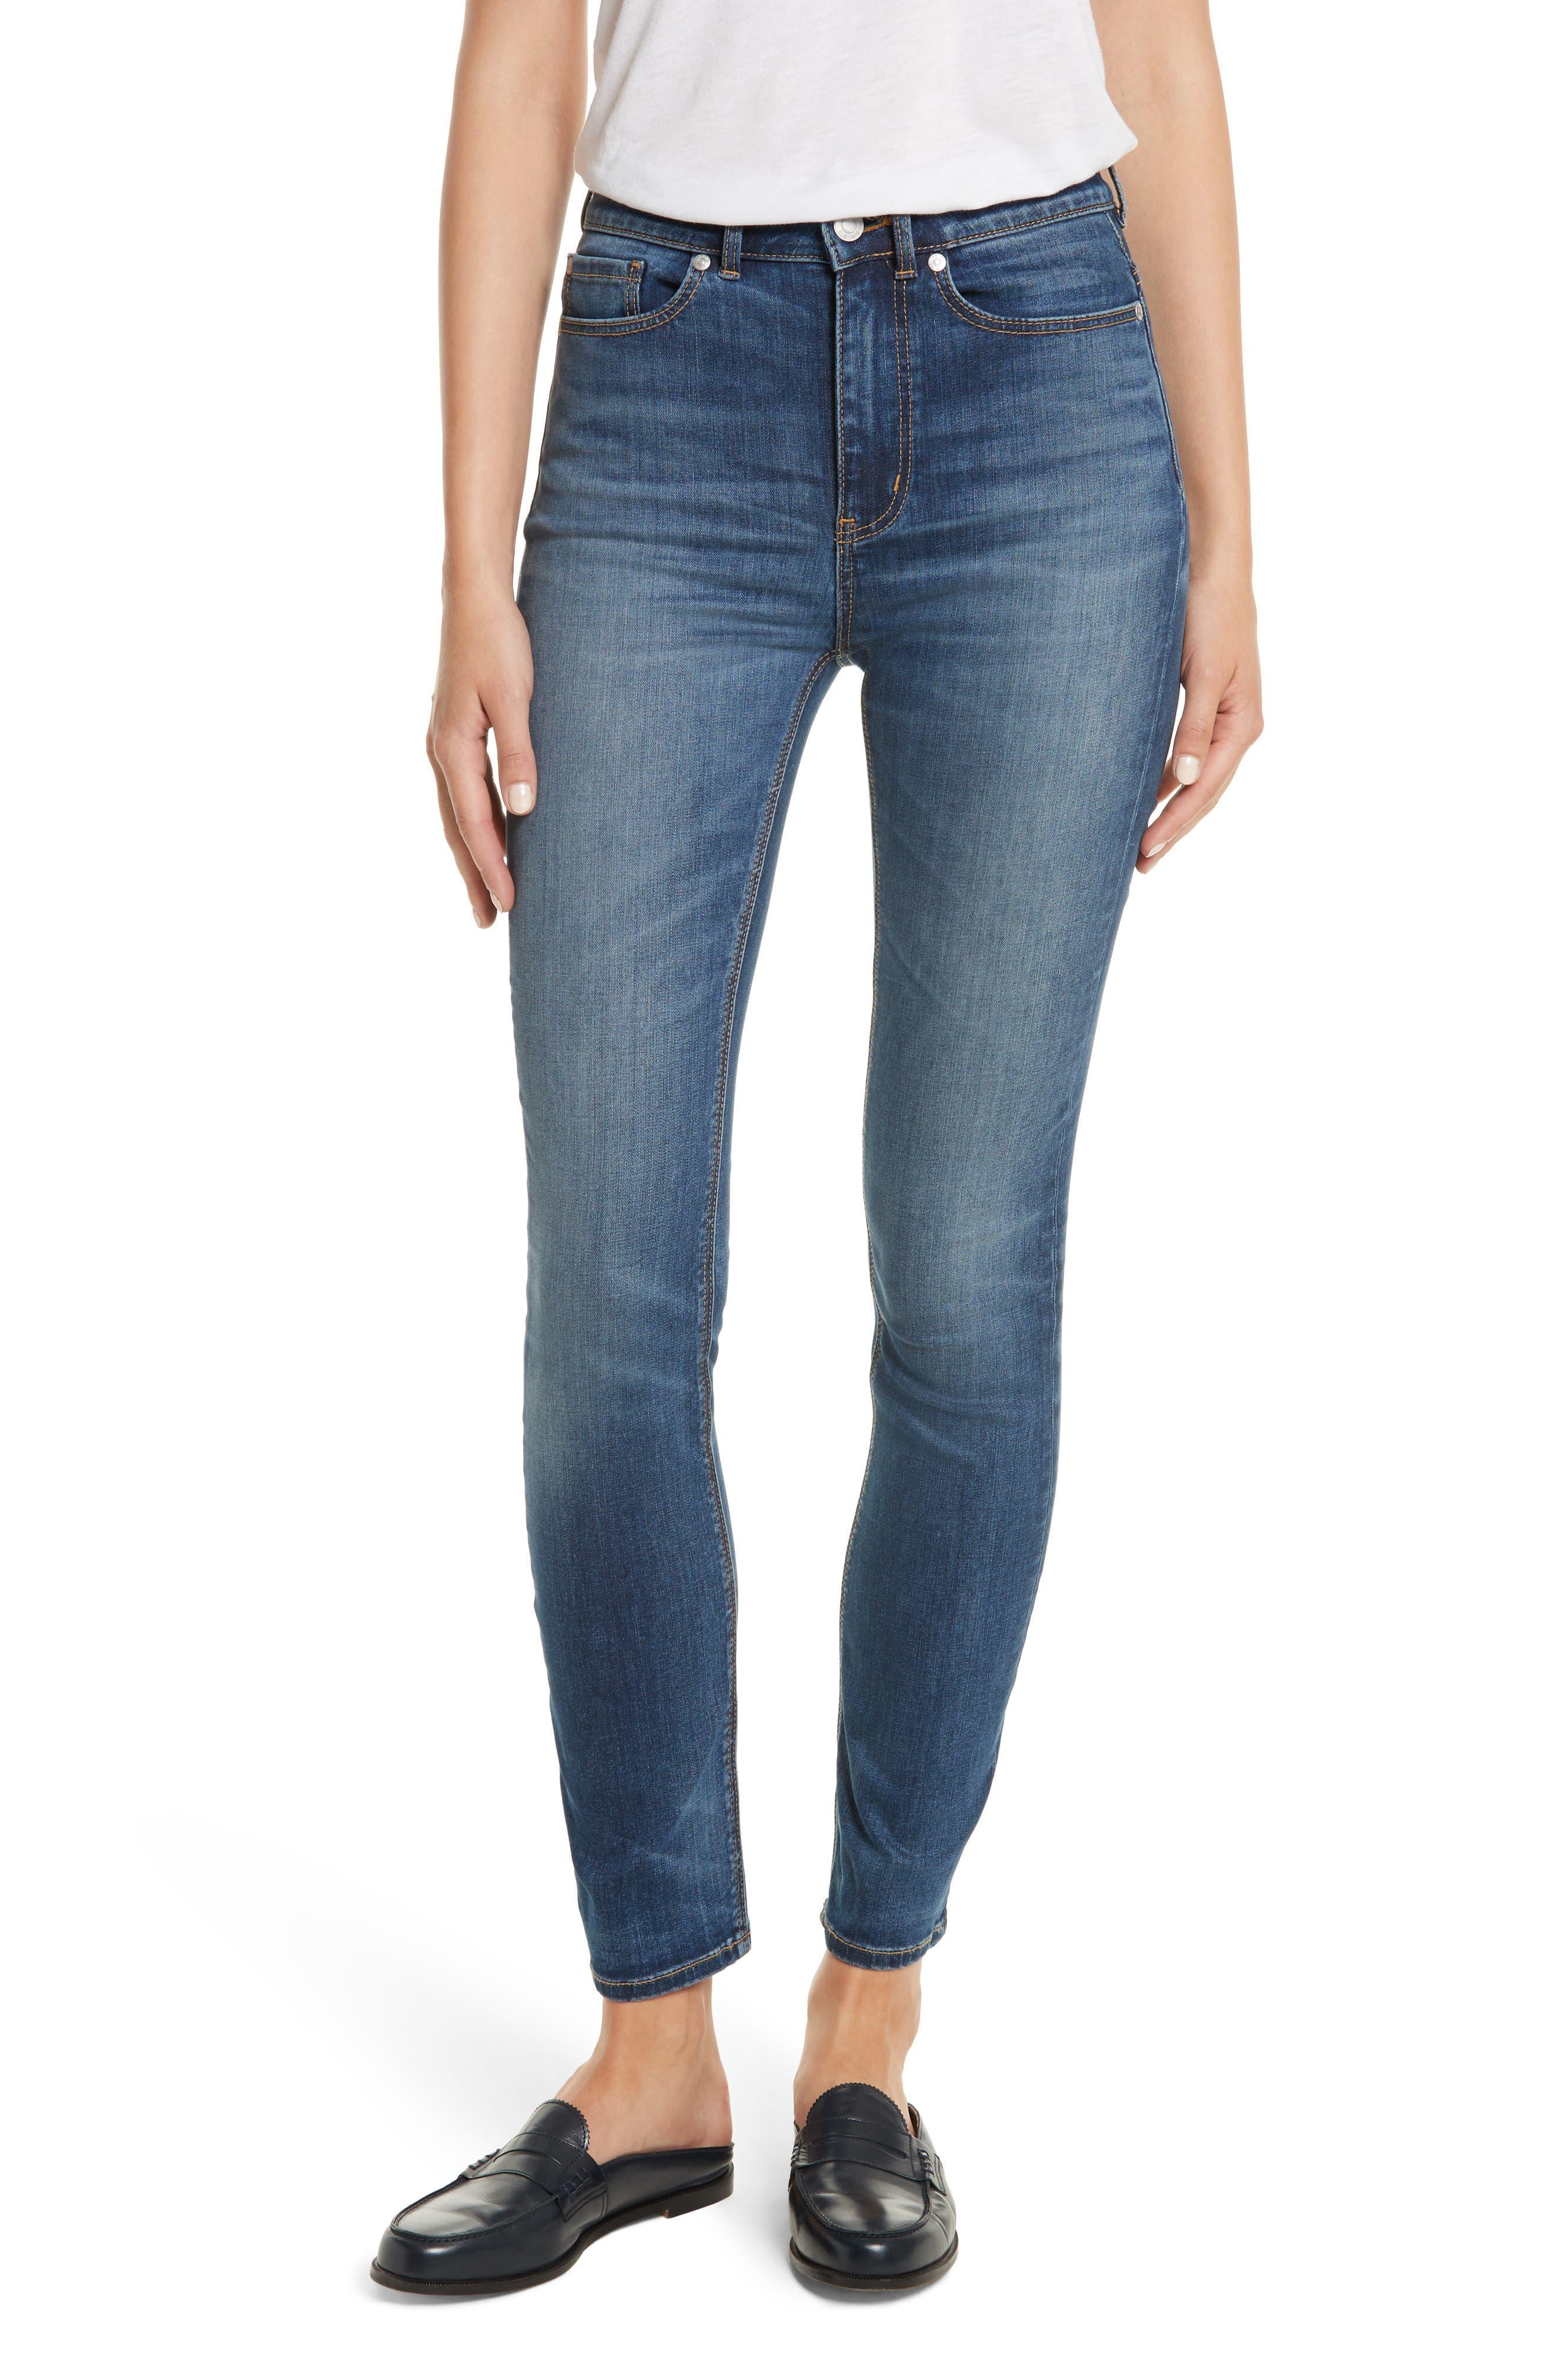 Alternate Image 1 Selected - Rebecca Taylor Clemence Skinny Jeans (Verite)